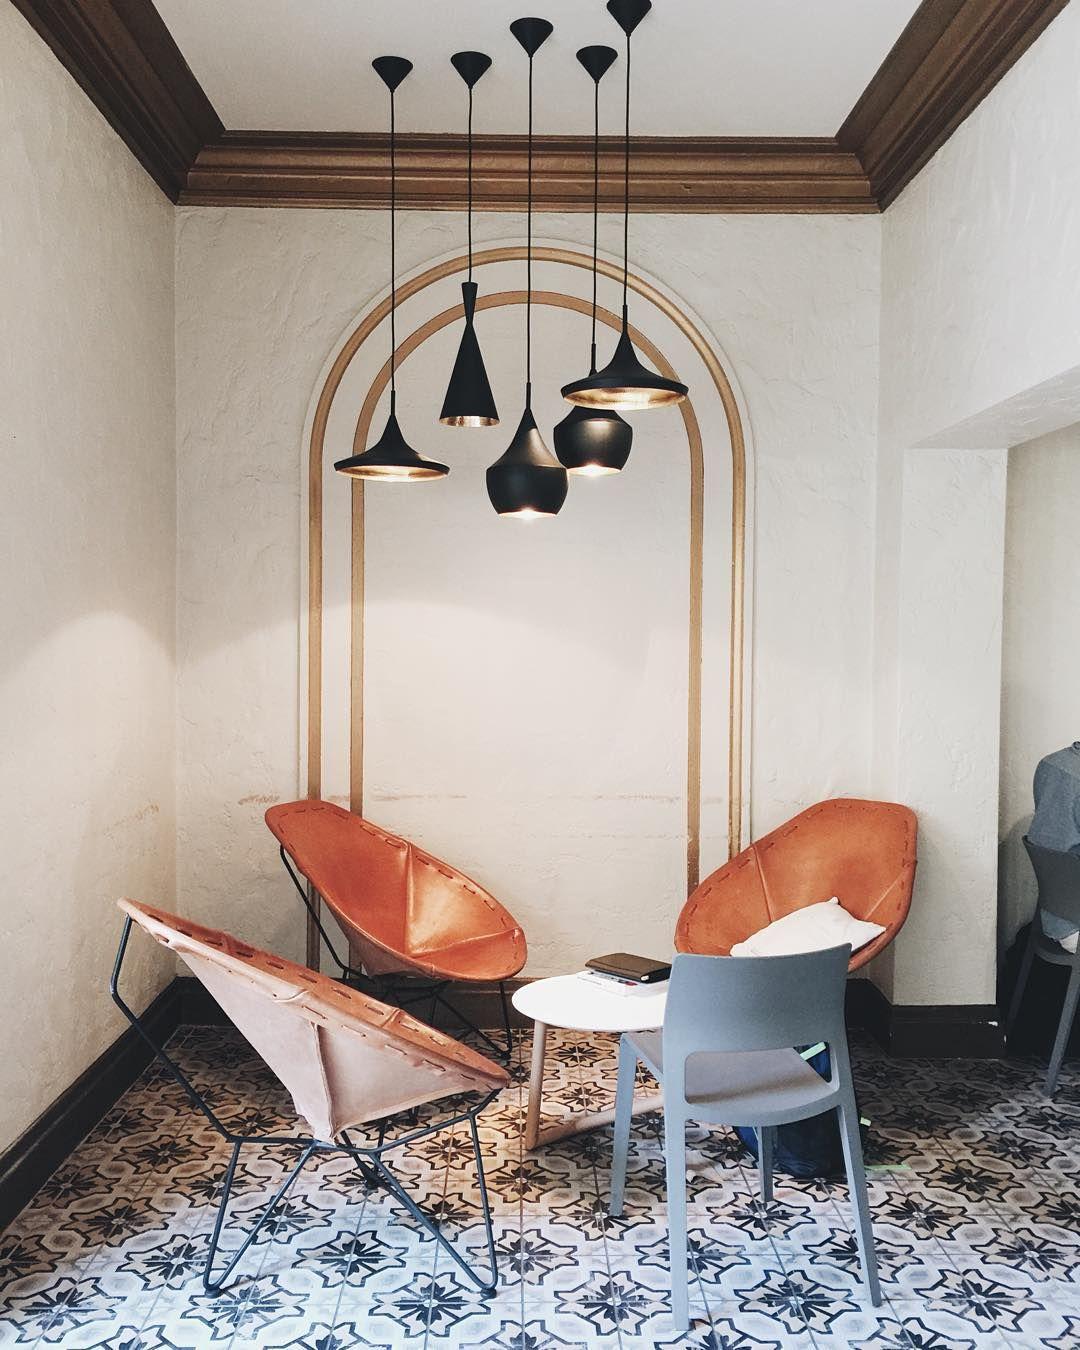 Gentil Tom Dixon Palo Alto CA Project By Gensler Design Via Archiproducts  Interior,  Design